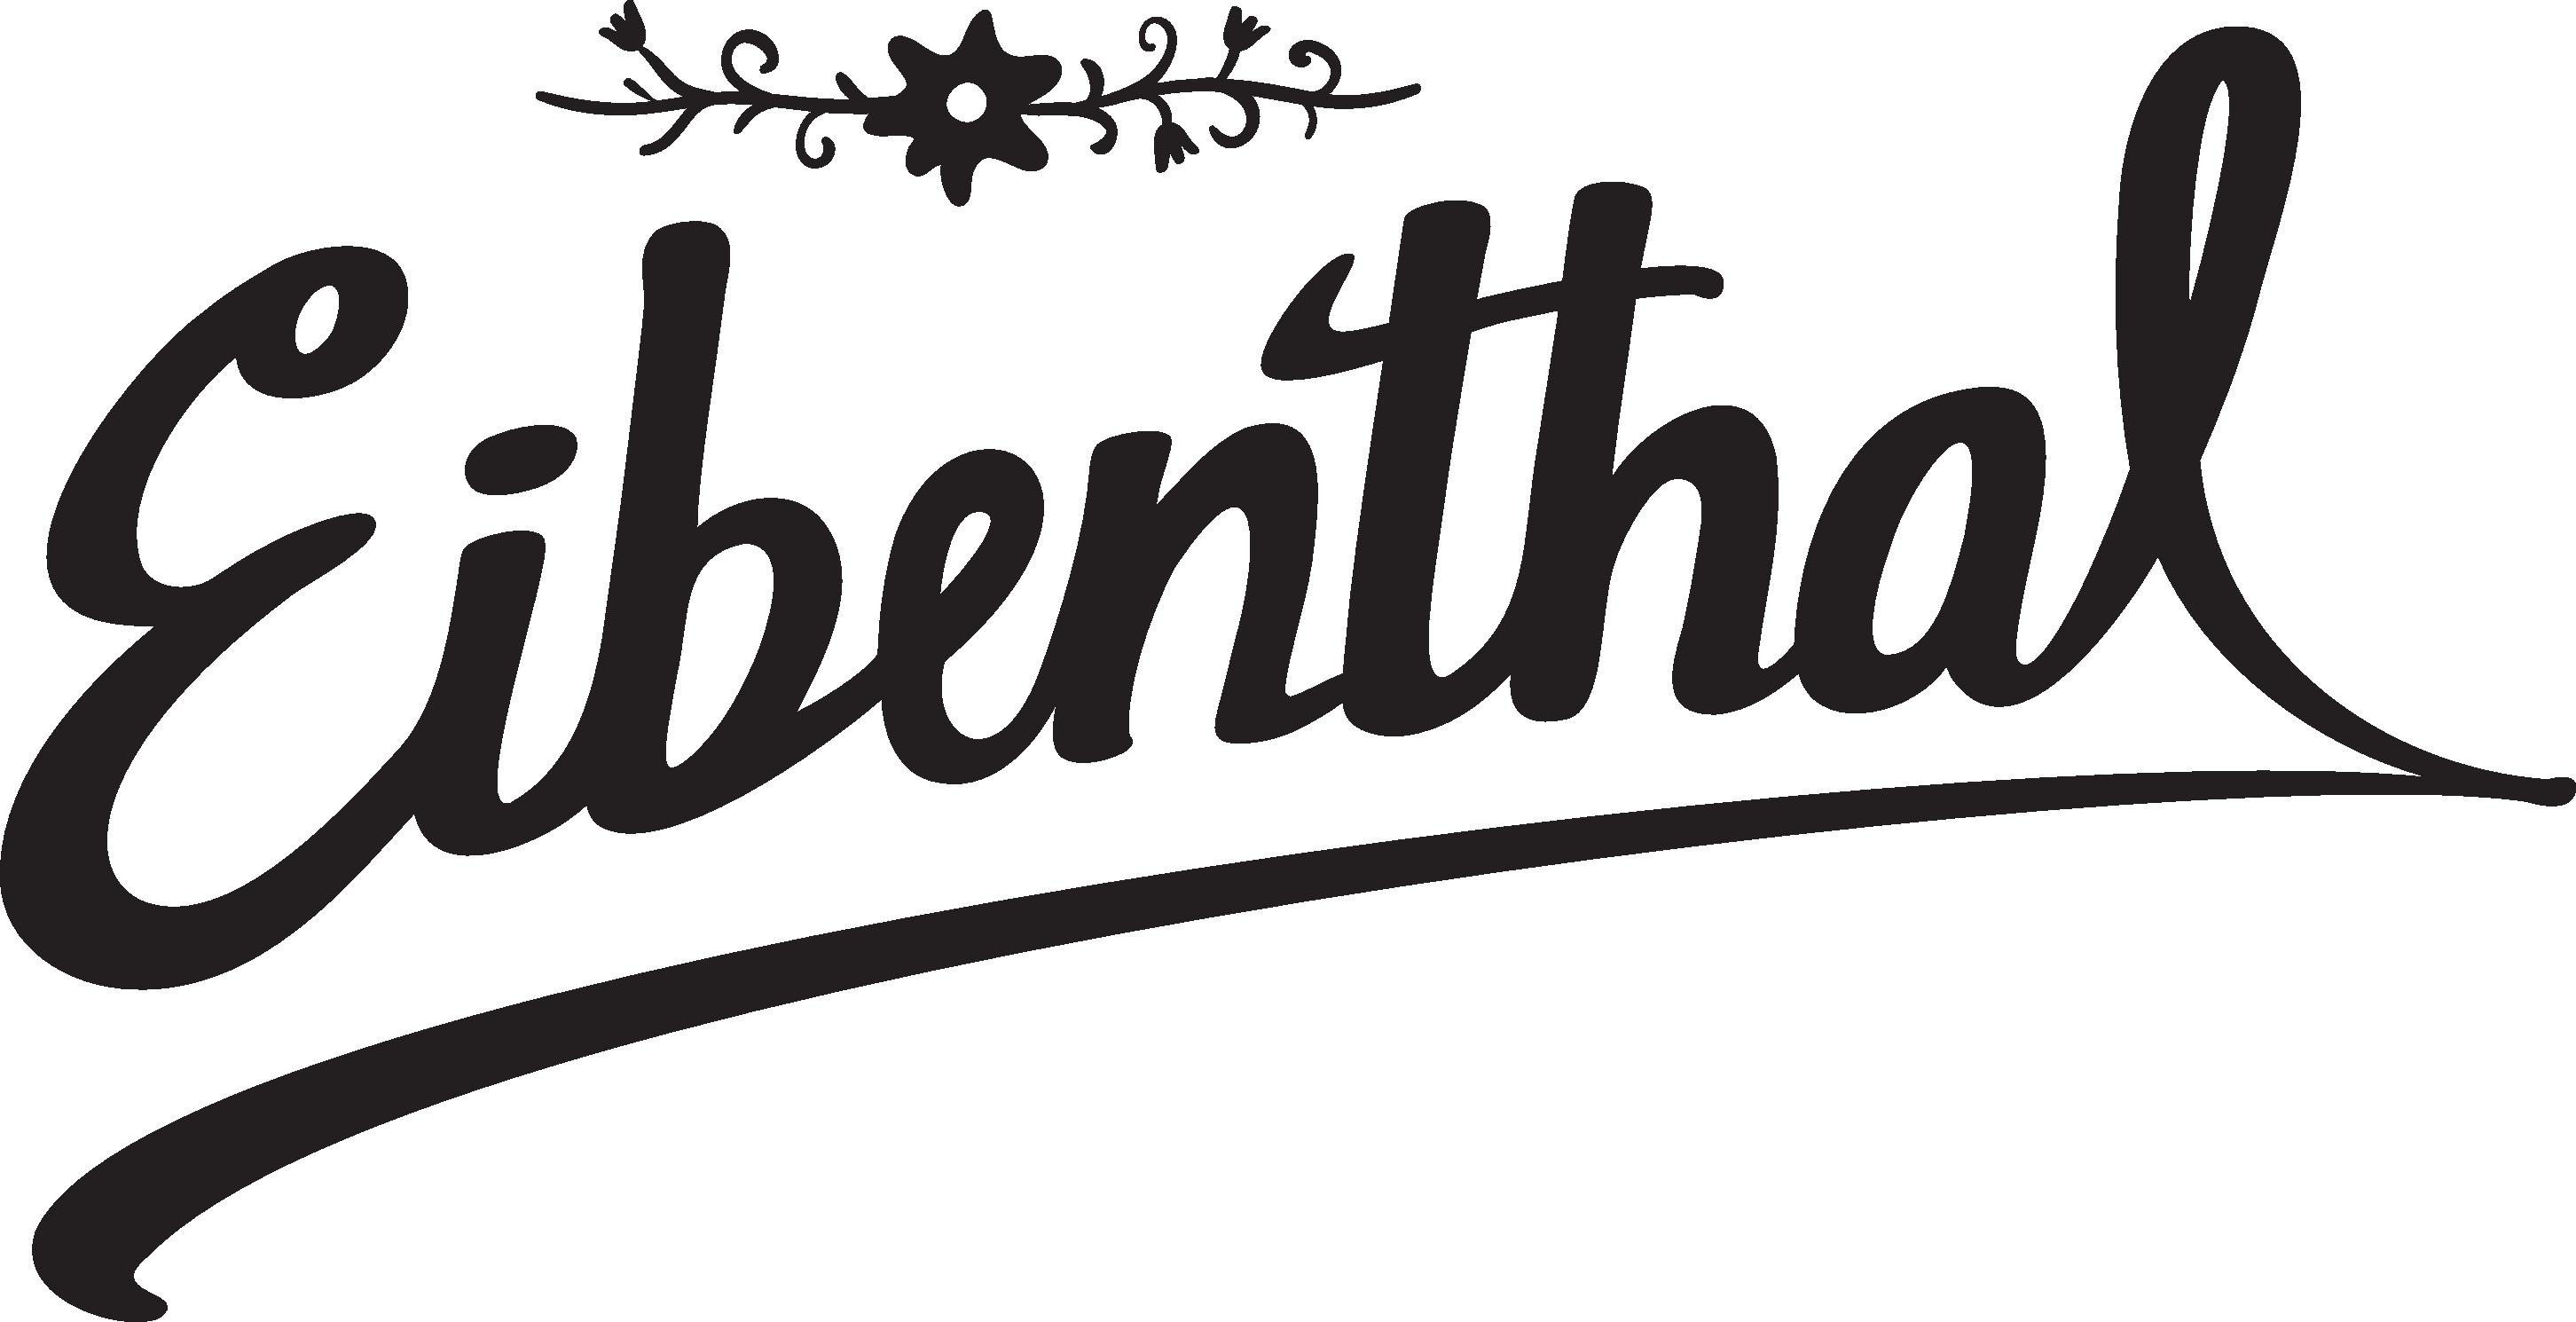 Manufaktura Eibenthal